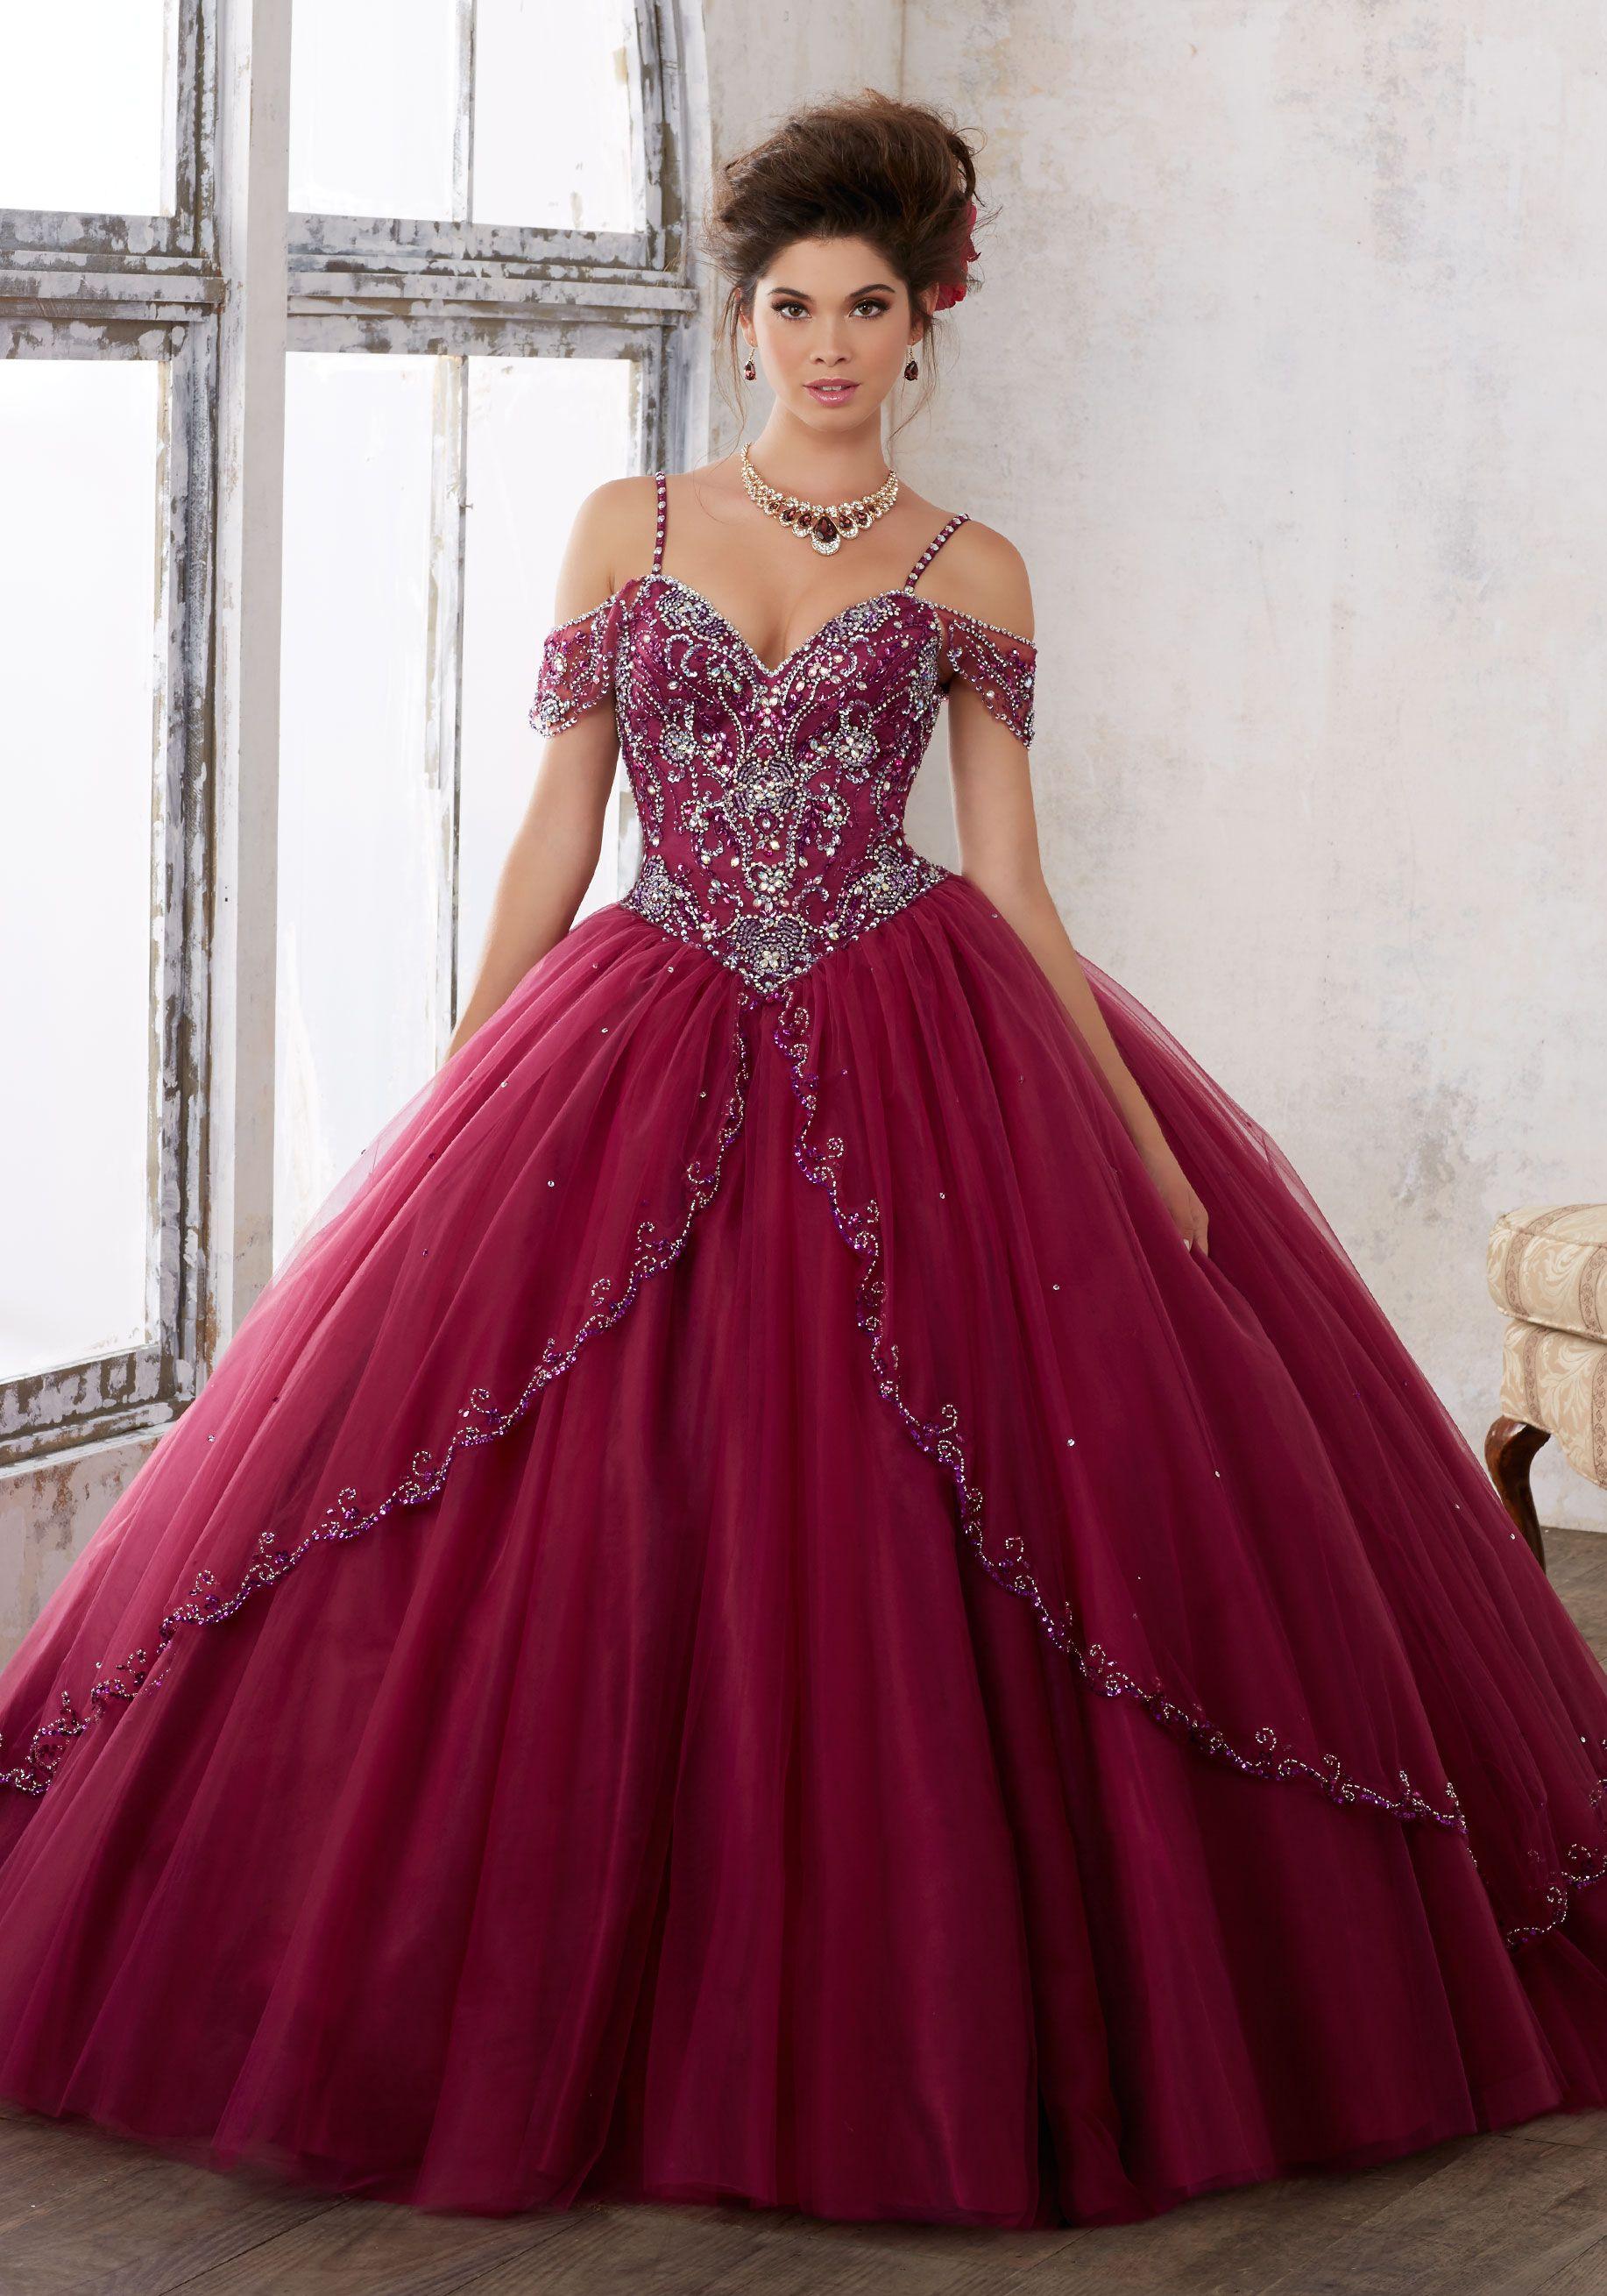 Quinceanera dresses fashion show 96